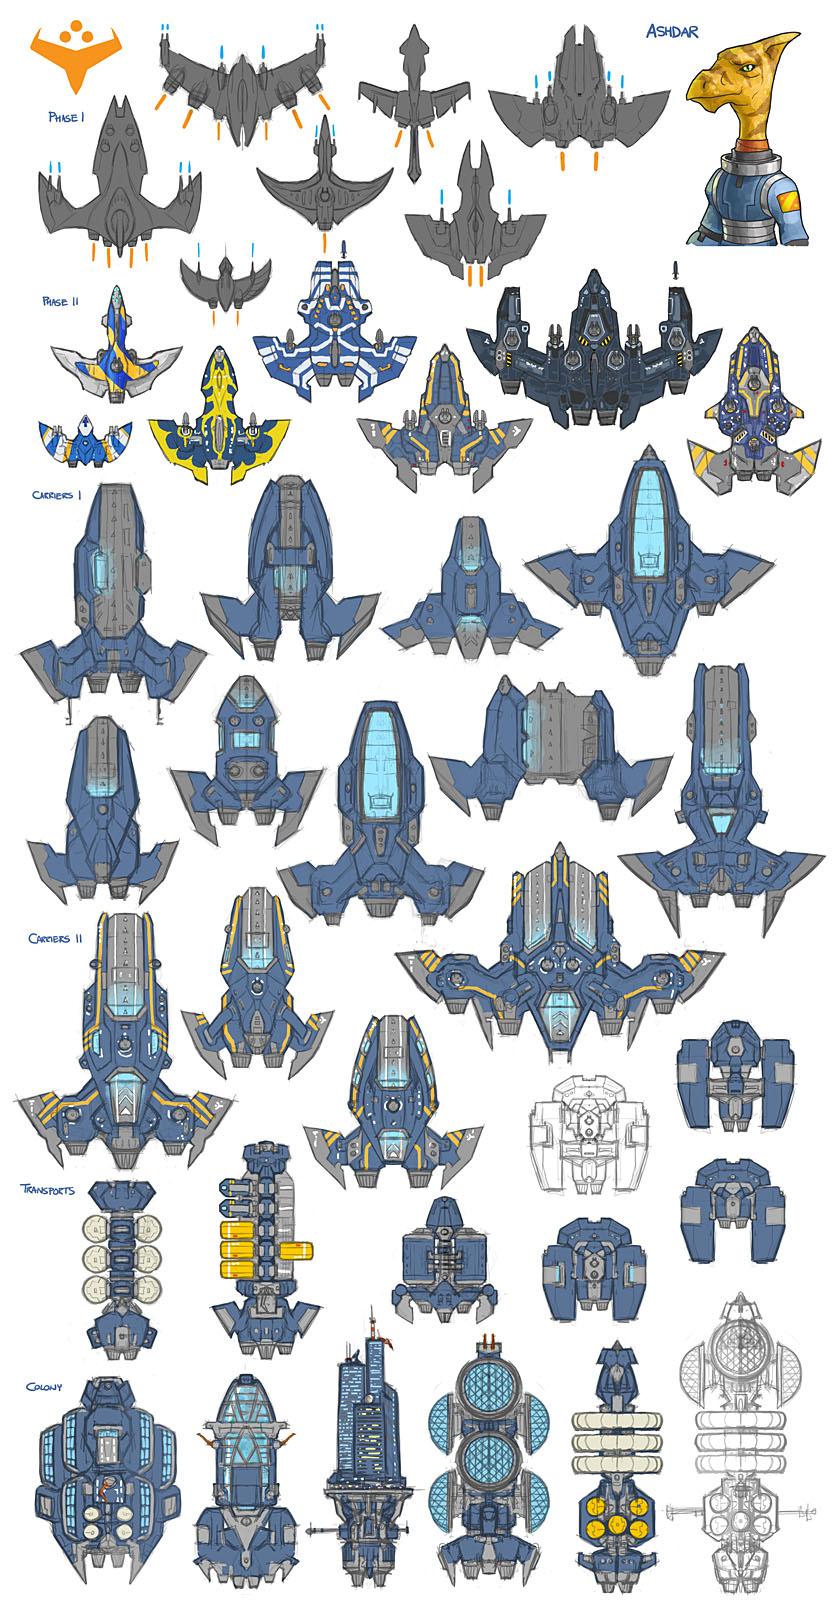 Stars in Shadow: Ashdar Design Thumbnails by AriochIV